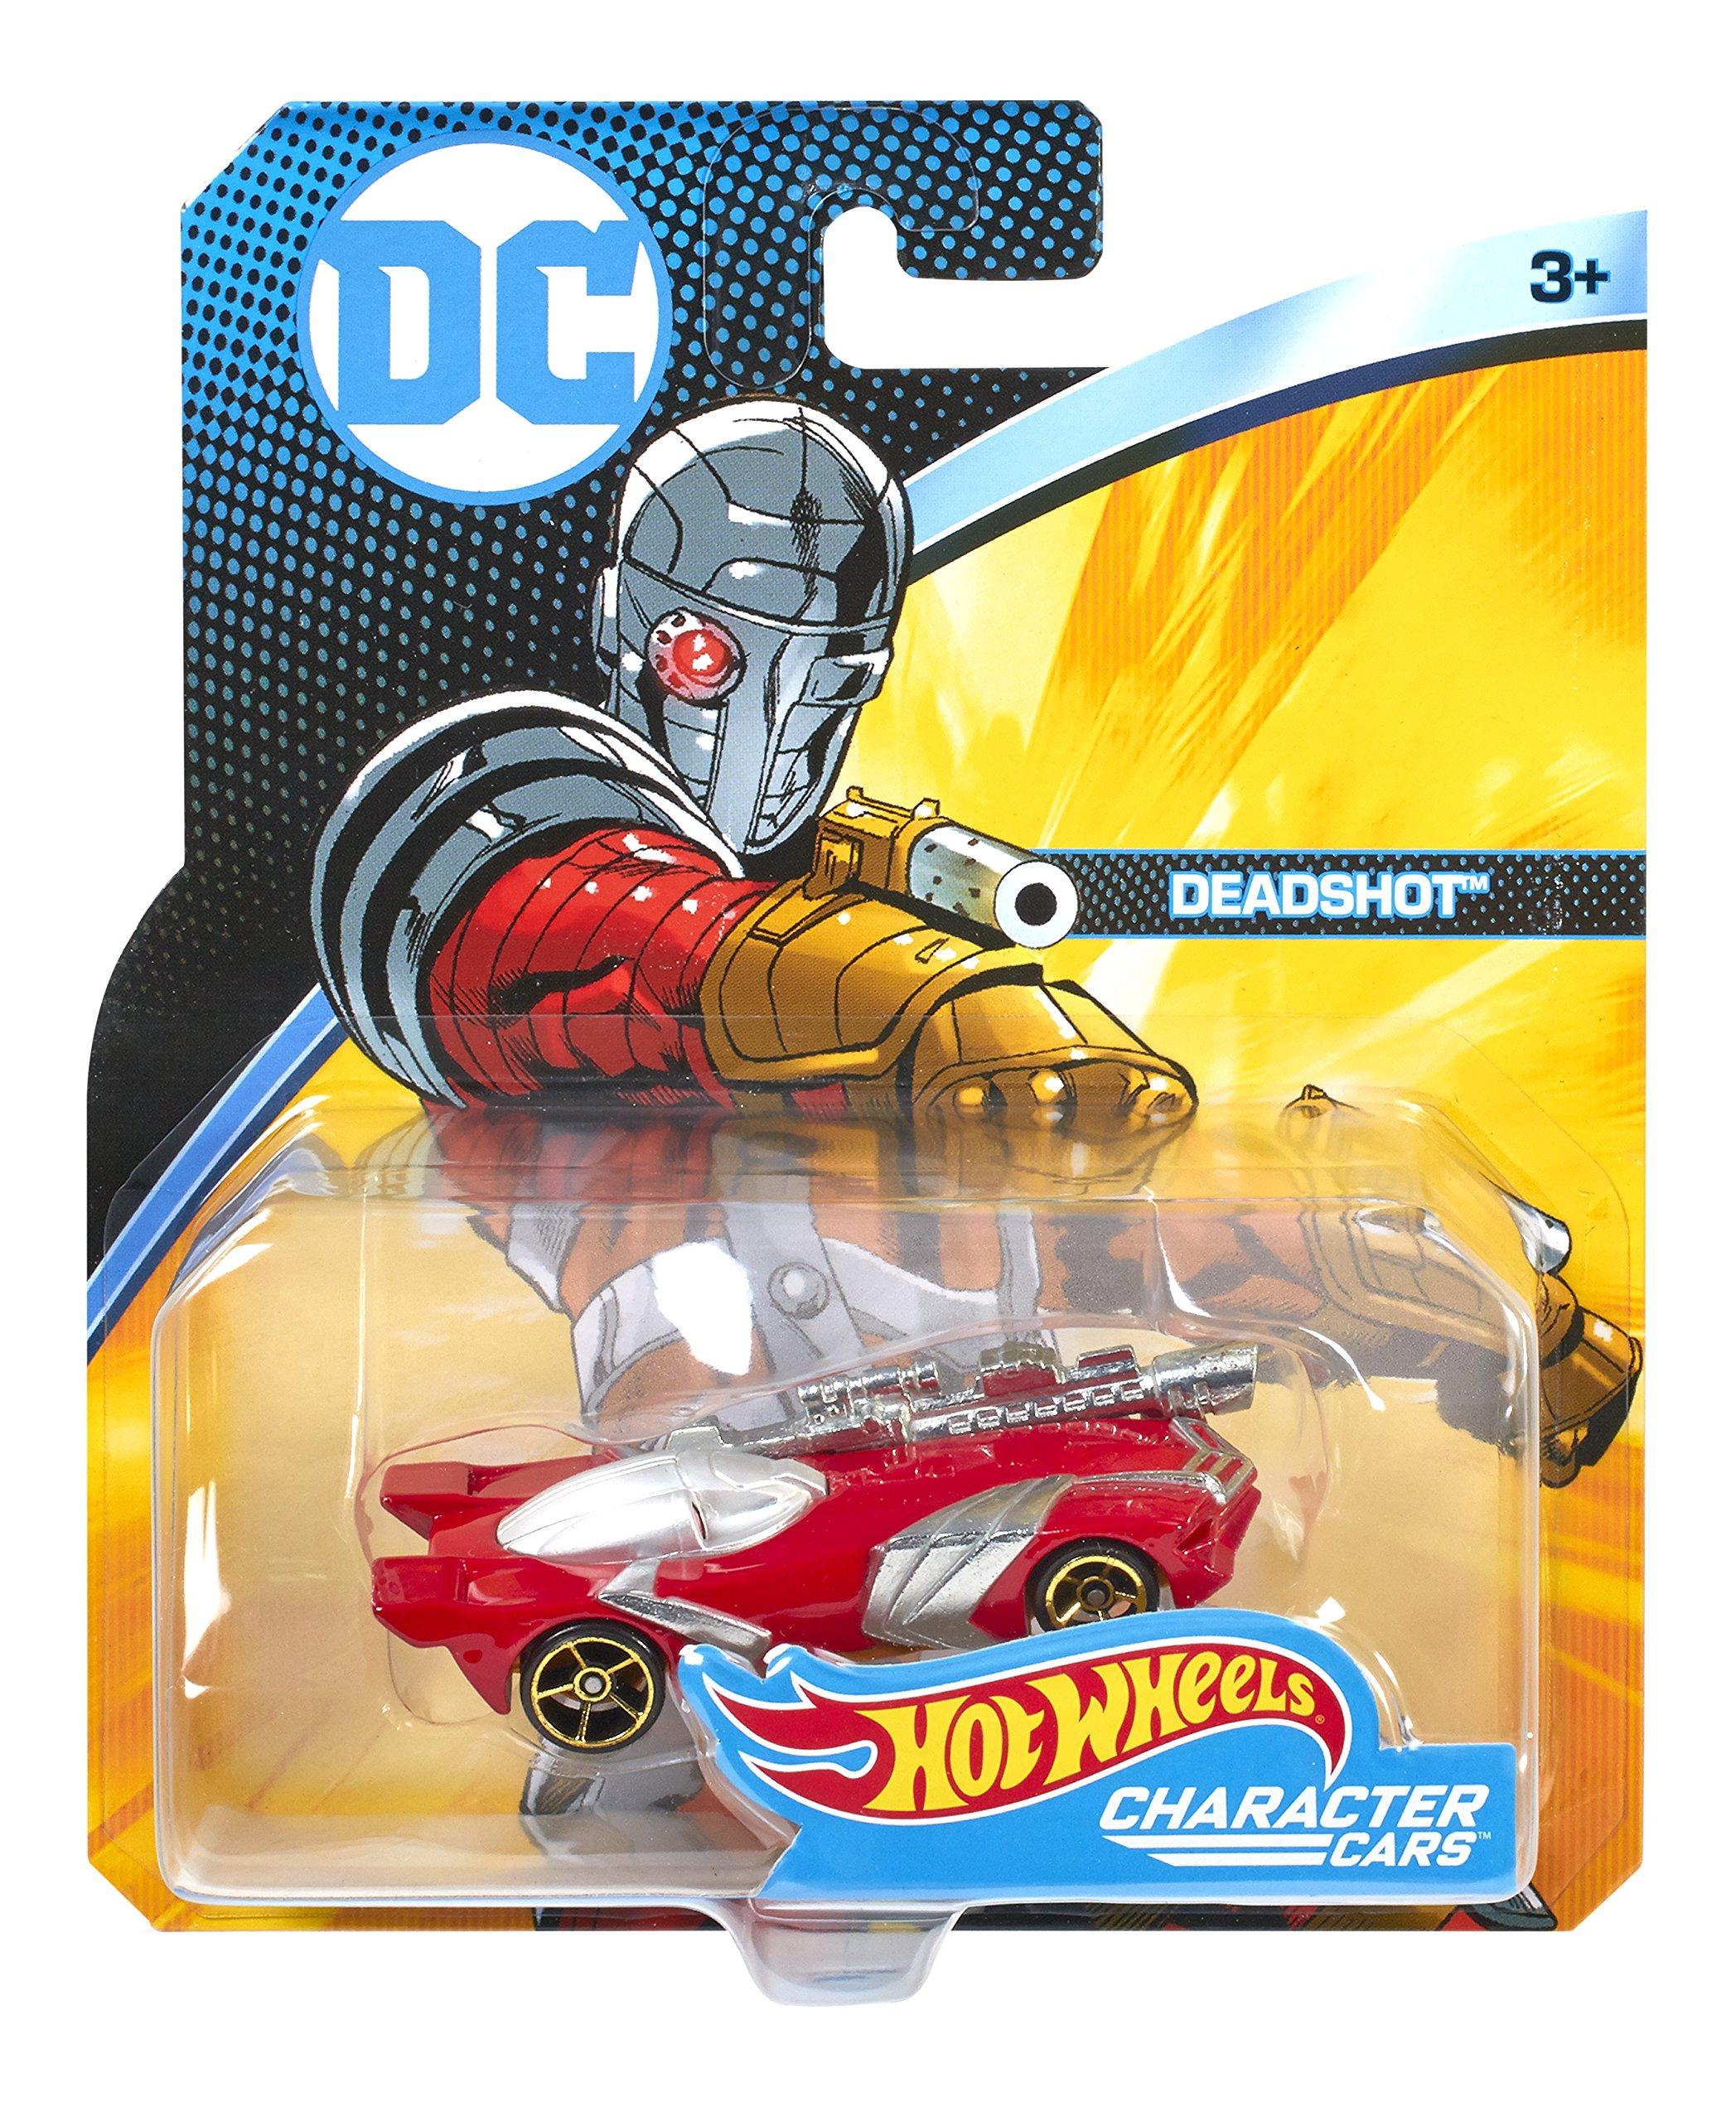 Hot Wheels DC Universe Deadshot Vehicle